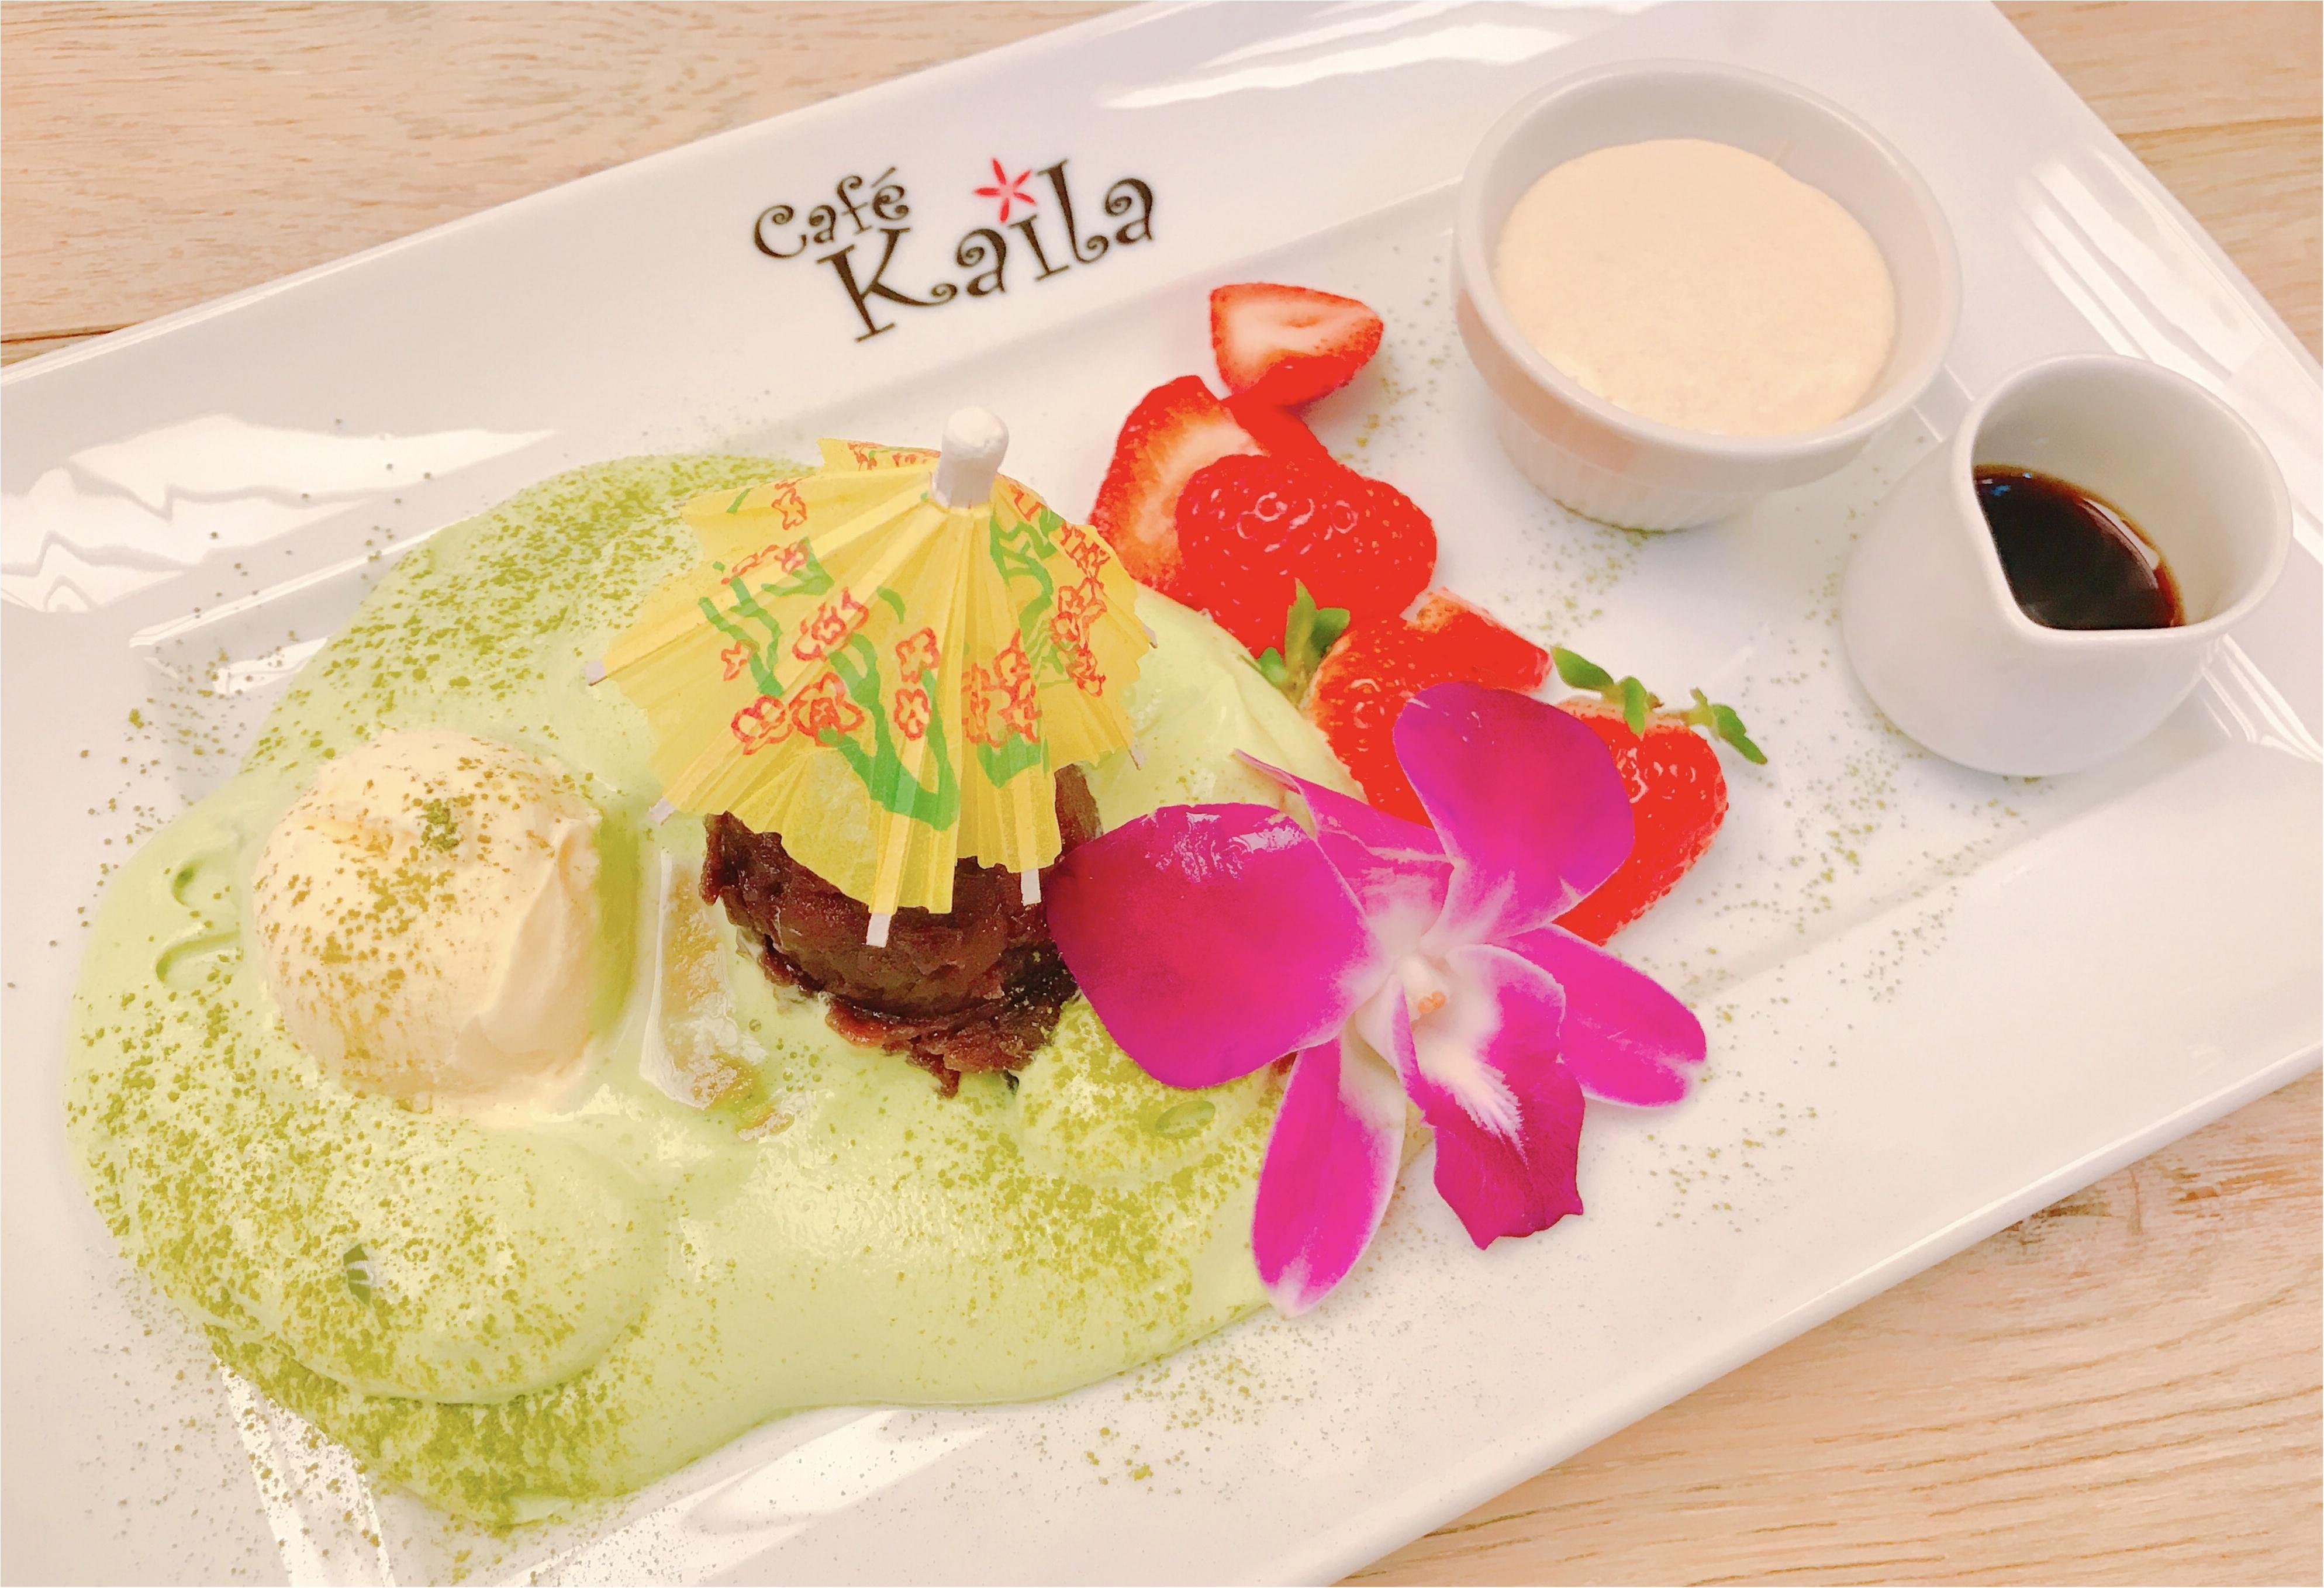 【Cafe Kaila】ハワイ本店でもあっという間に完売してしまう1日60食限定のスペシャルメニューとは♡_6